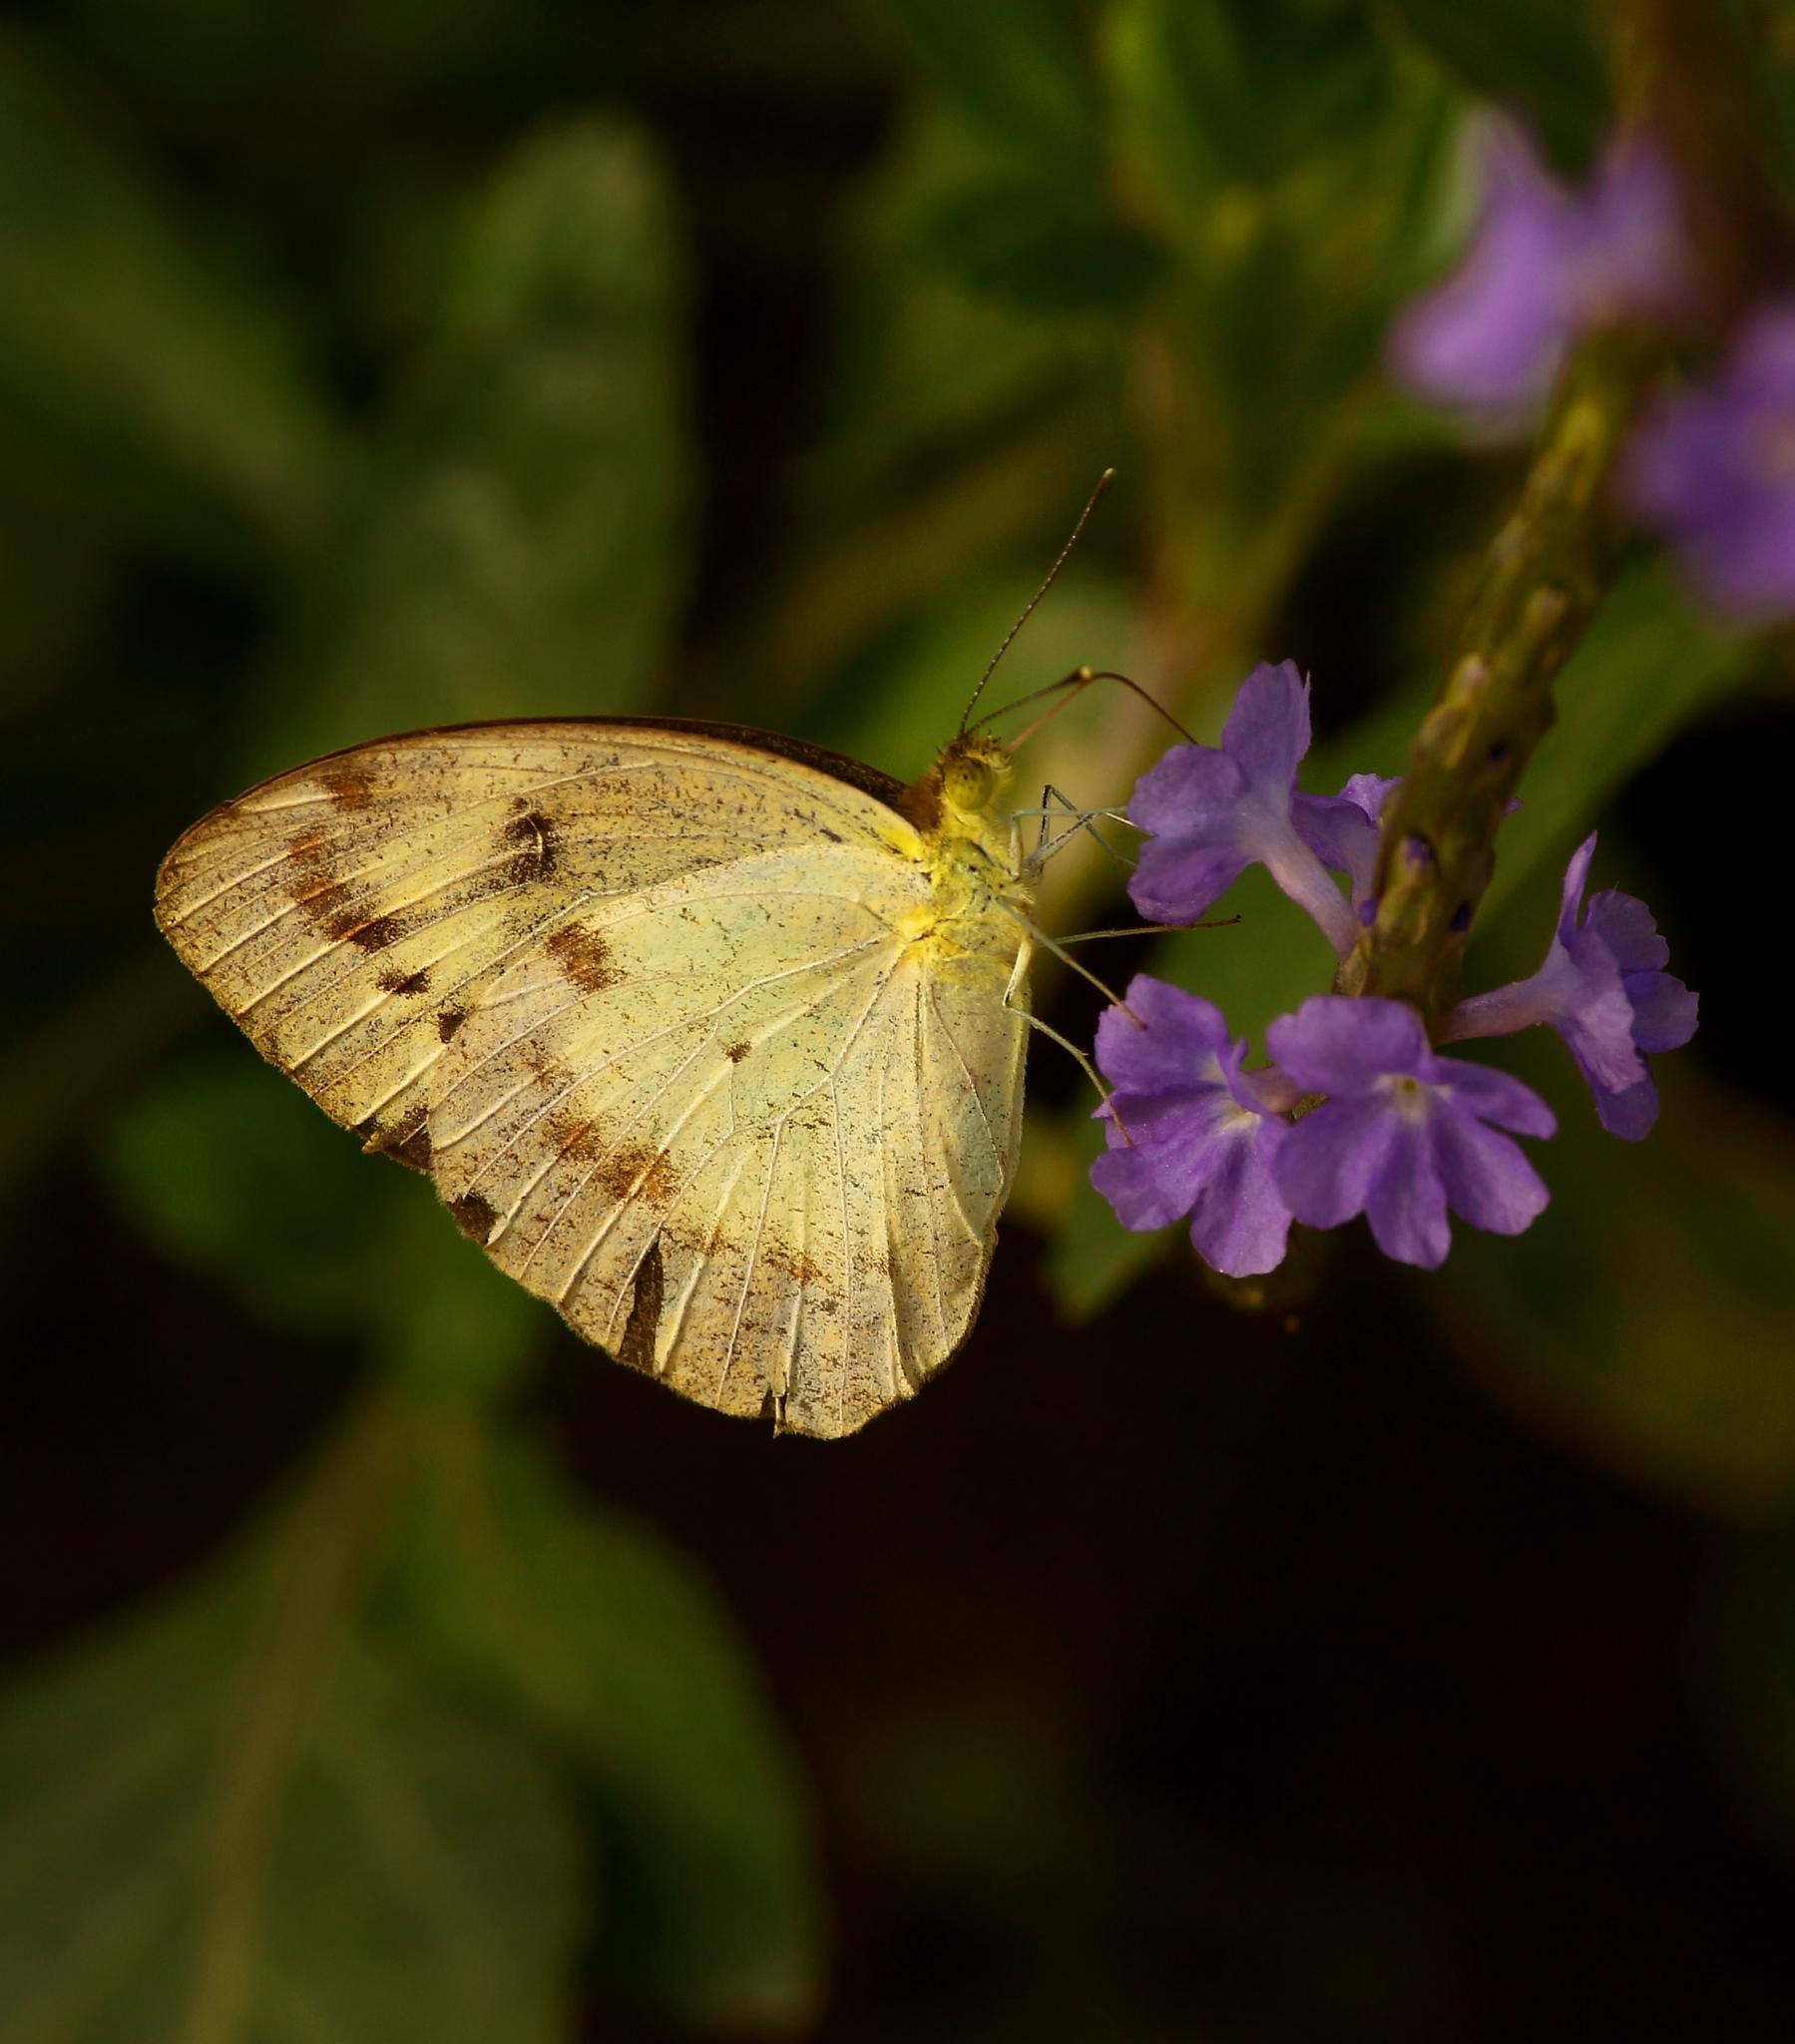 butterfly drinking honey from flower by Ramesha.Samarpana